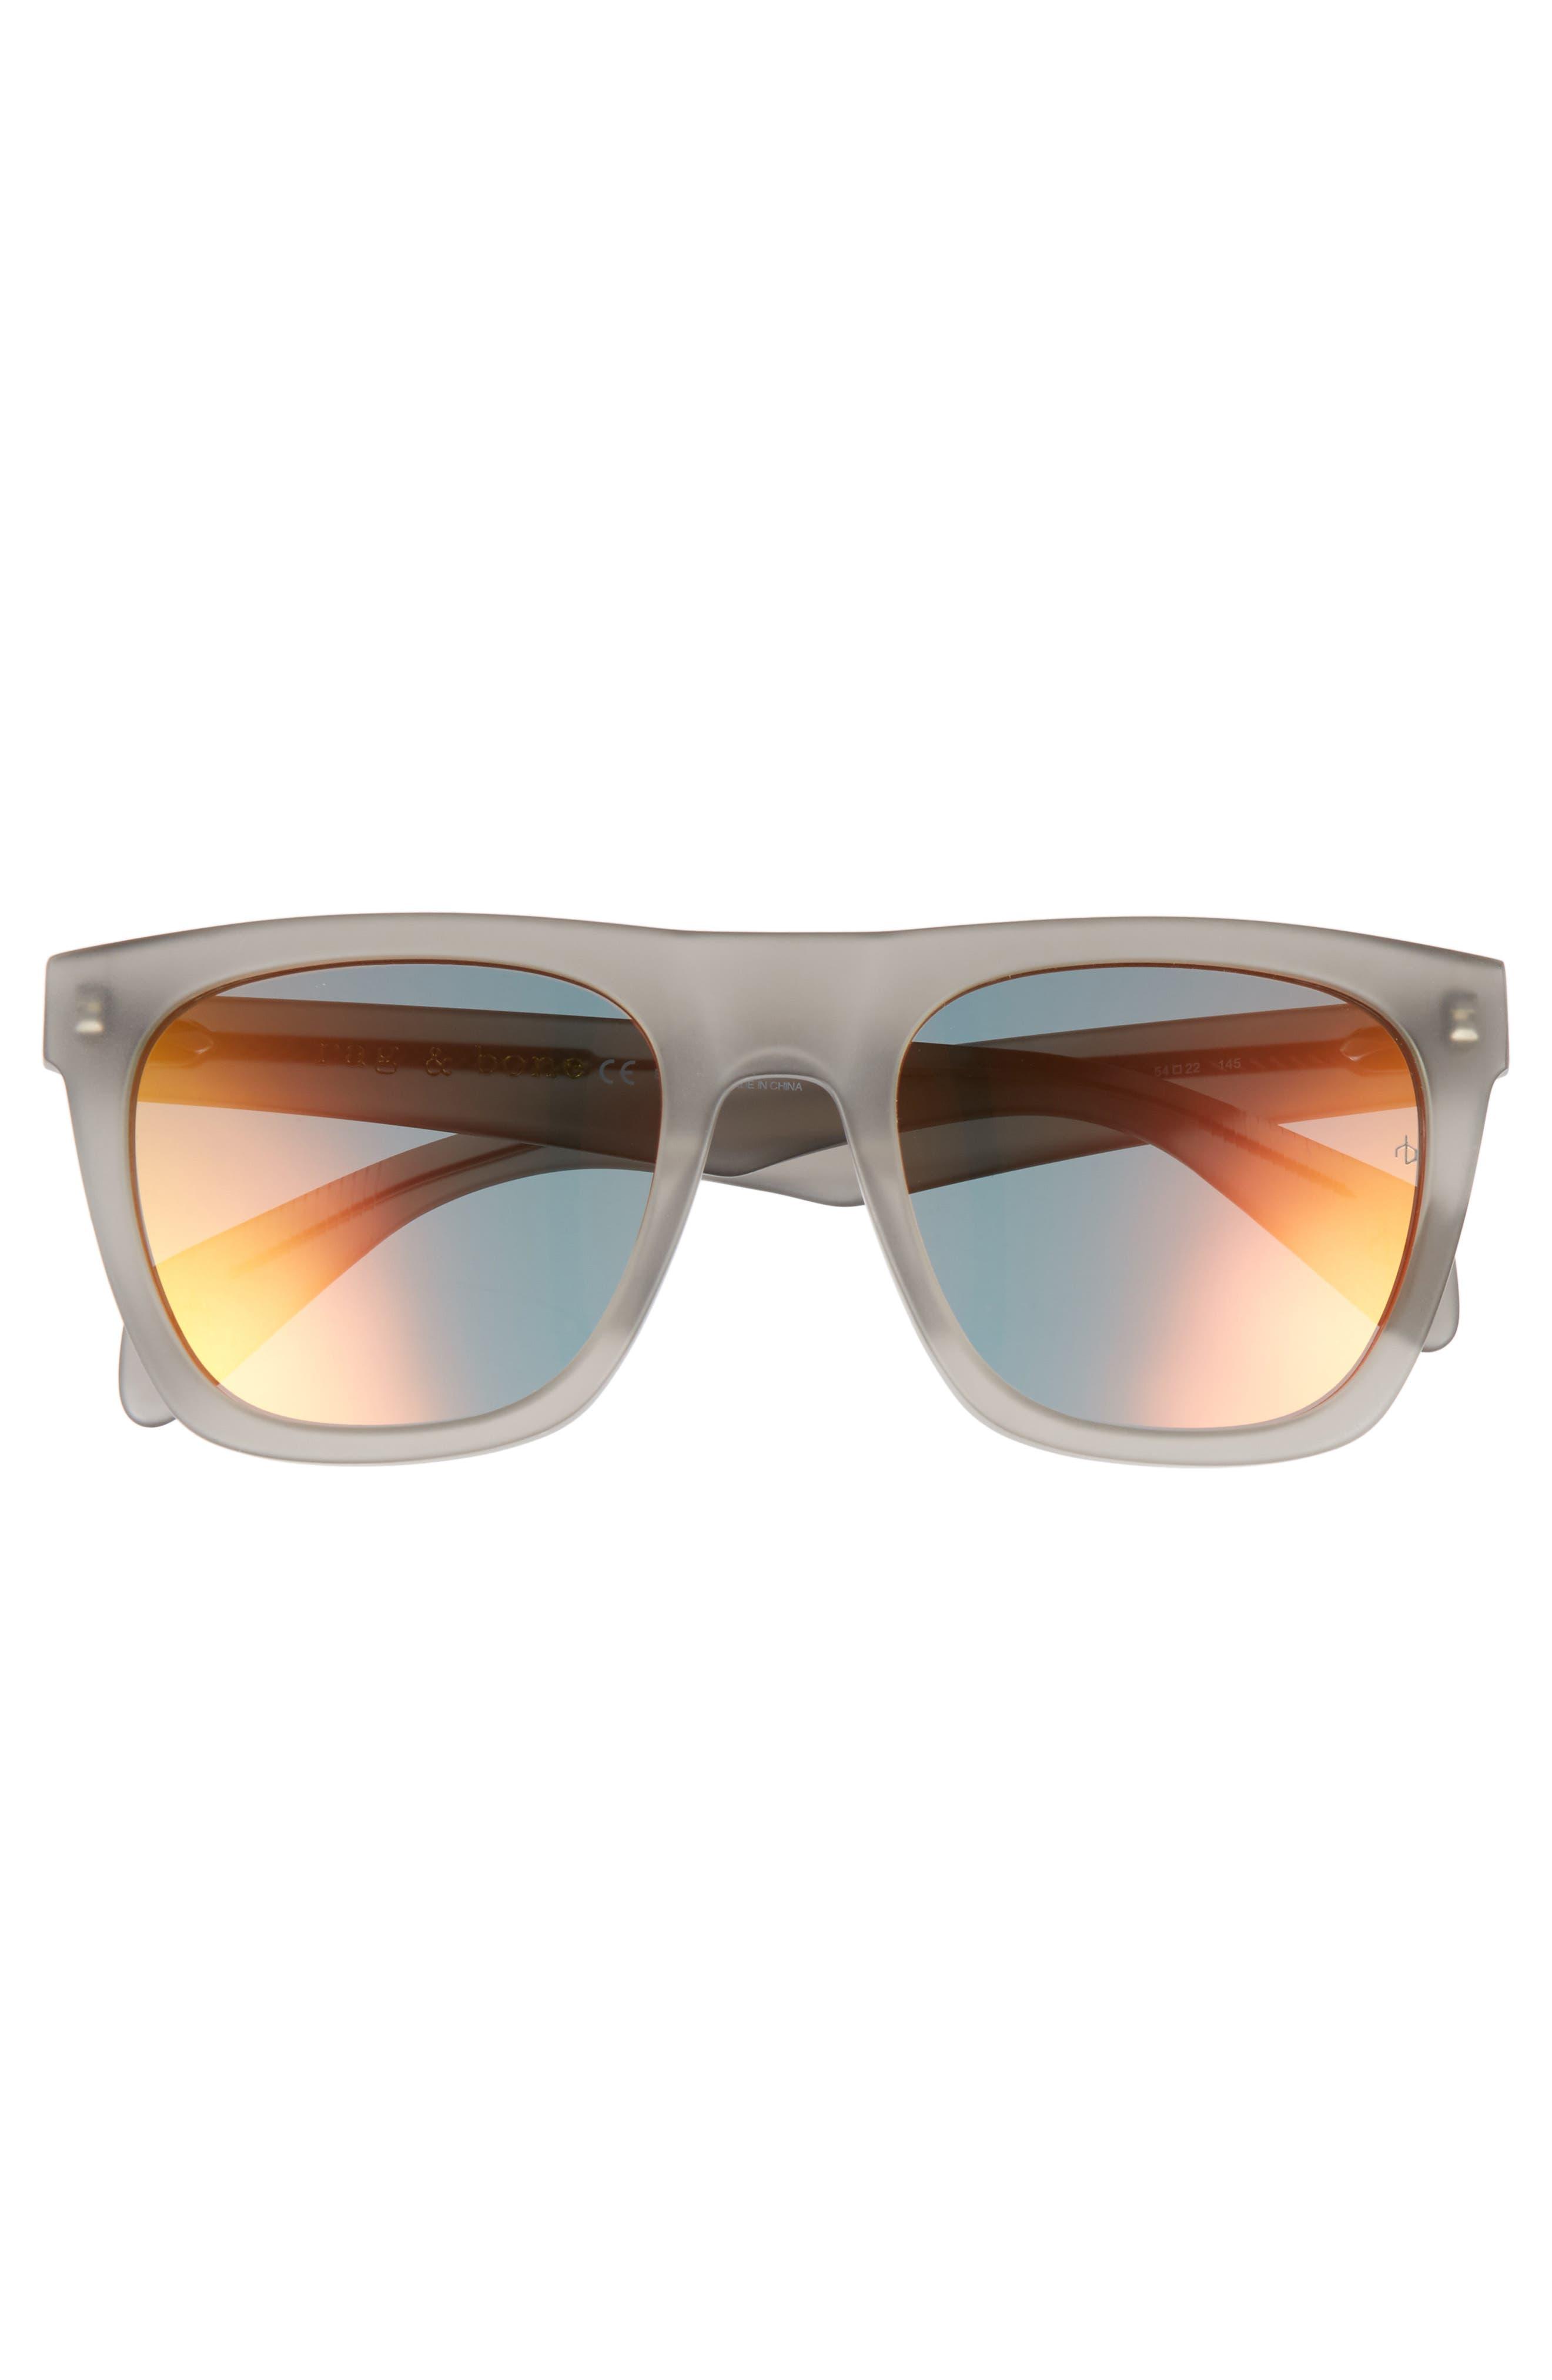 54mm Mirrored Sunglasses,                             Alternate thumbnail 2, color,                             Matte Grey